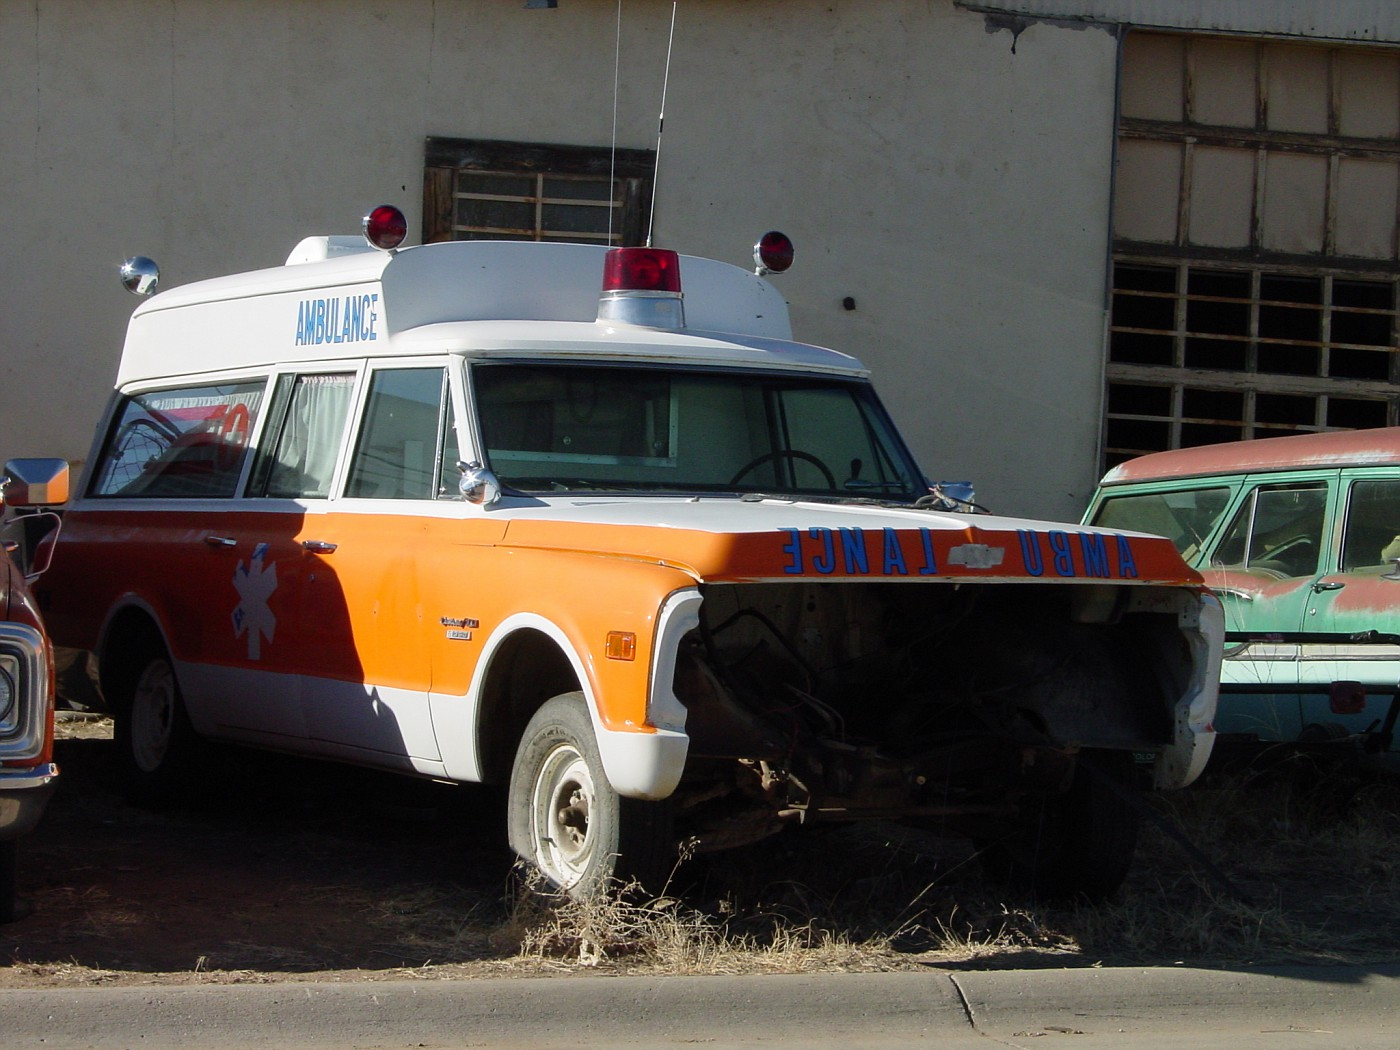 CO - Chevy ambulance (1969-1970) in a Colorado boneyard